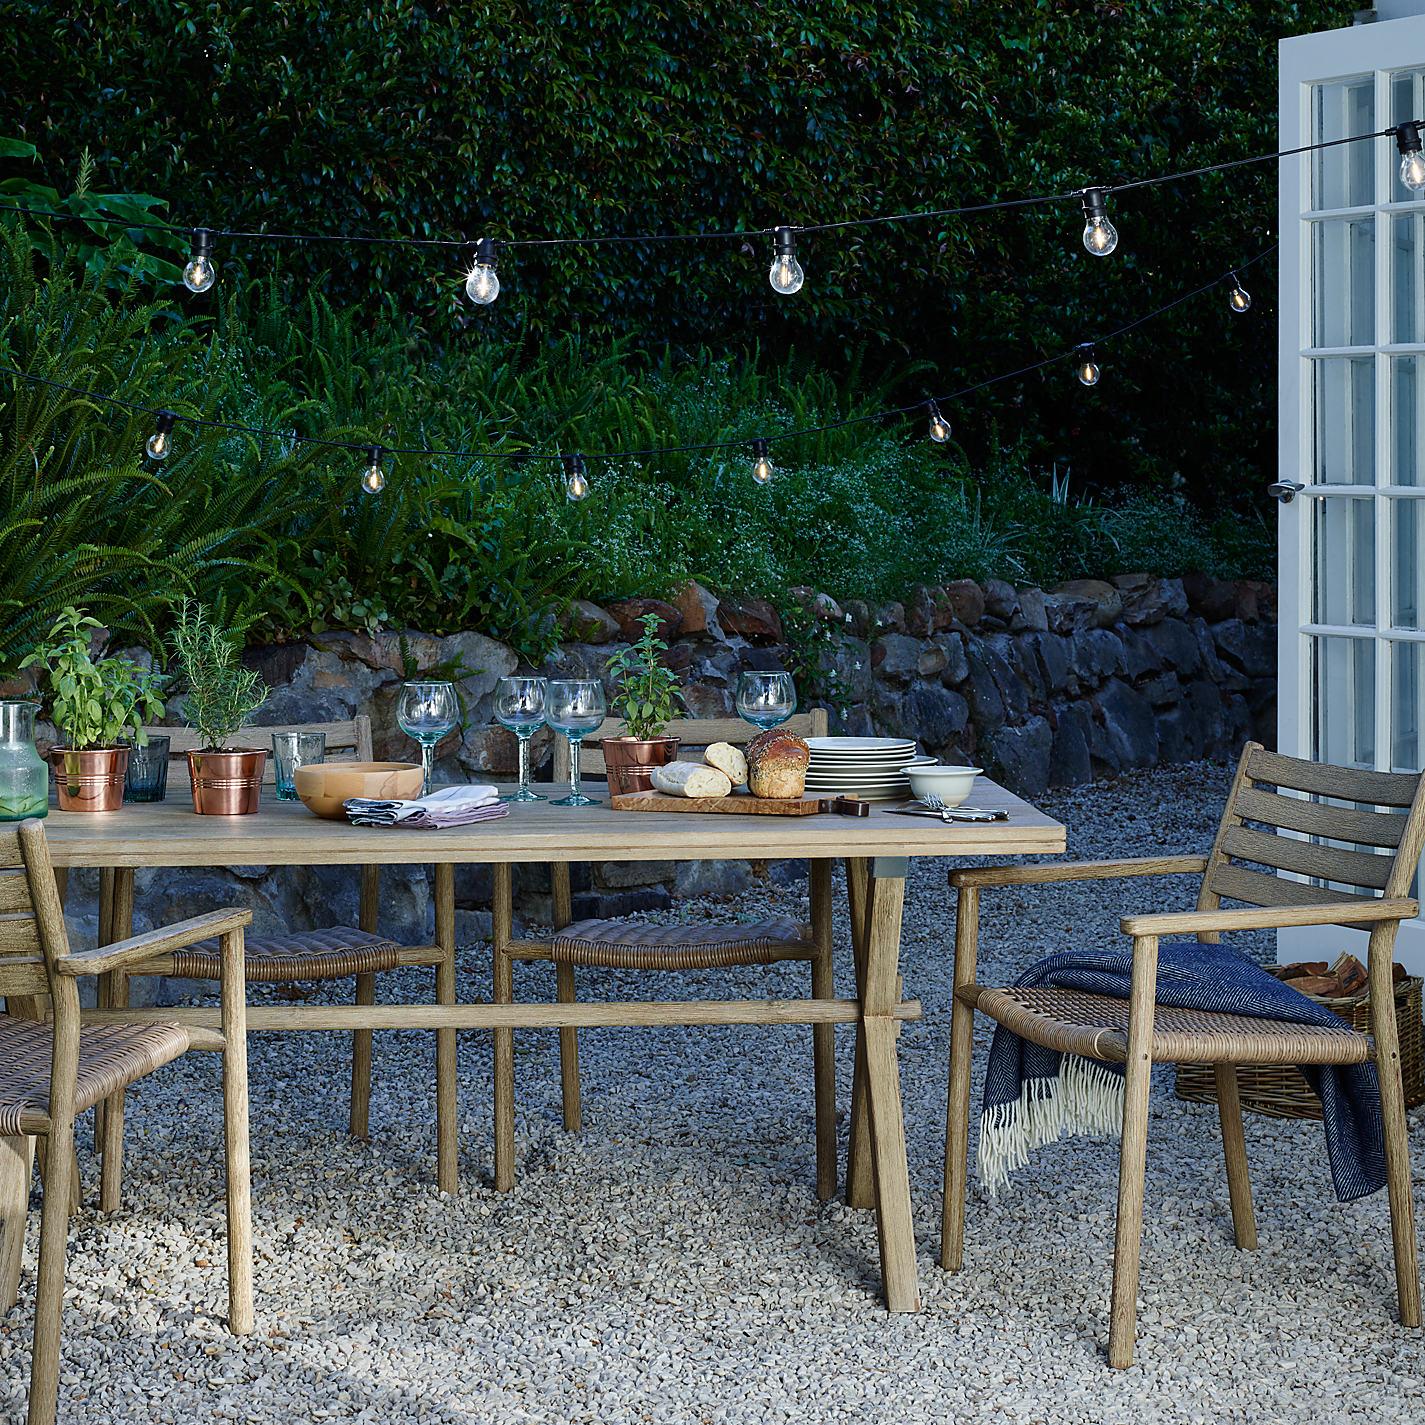 Buy John Lewis Croft Collection Islay Outdoor Furniture Online at johnlewis com. Buy John Lewis Croft Collection Islay Outdoor Furniture   John Lewis